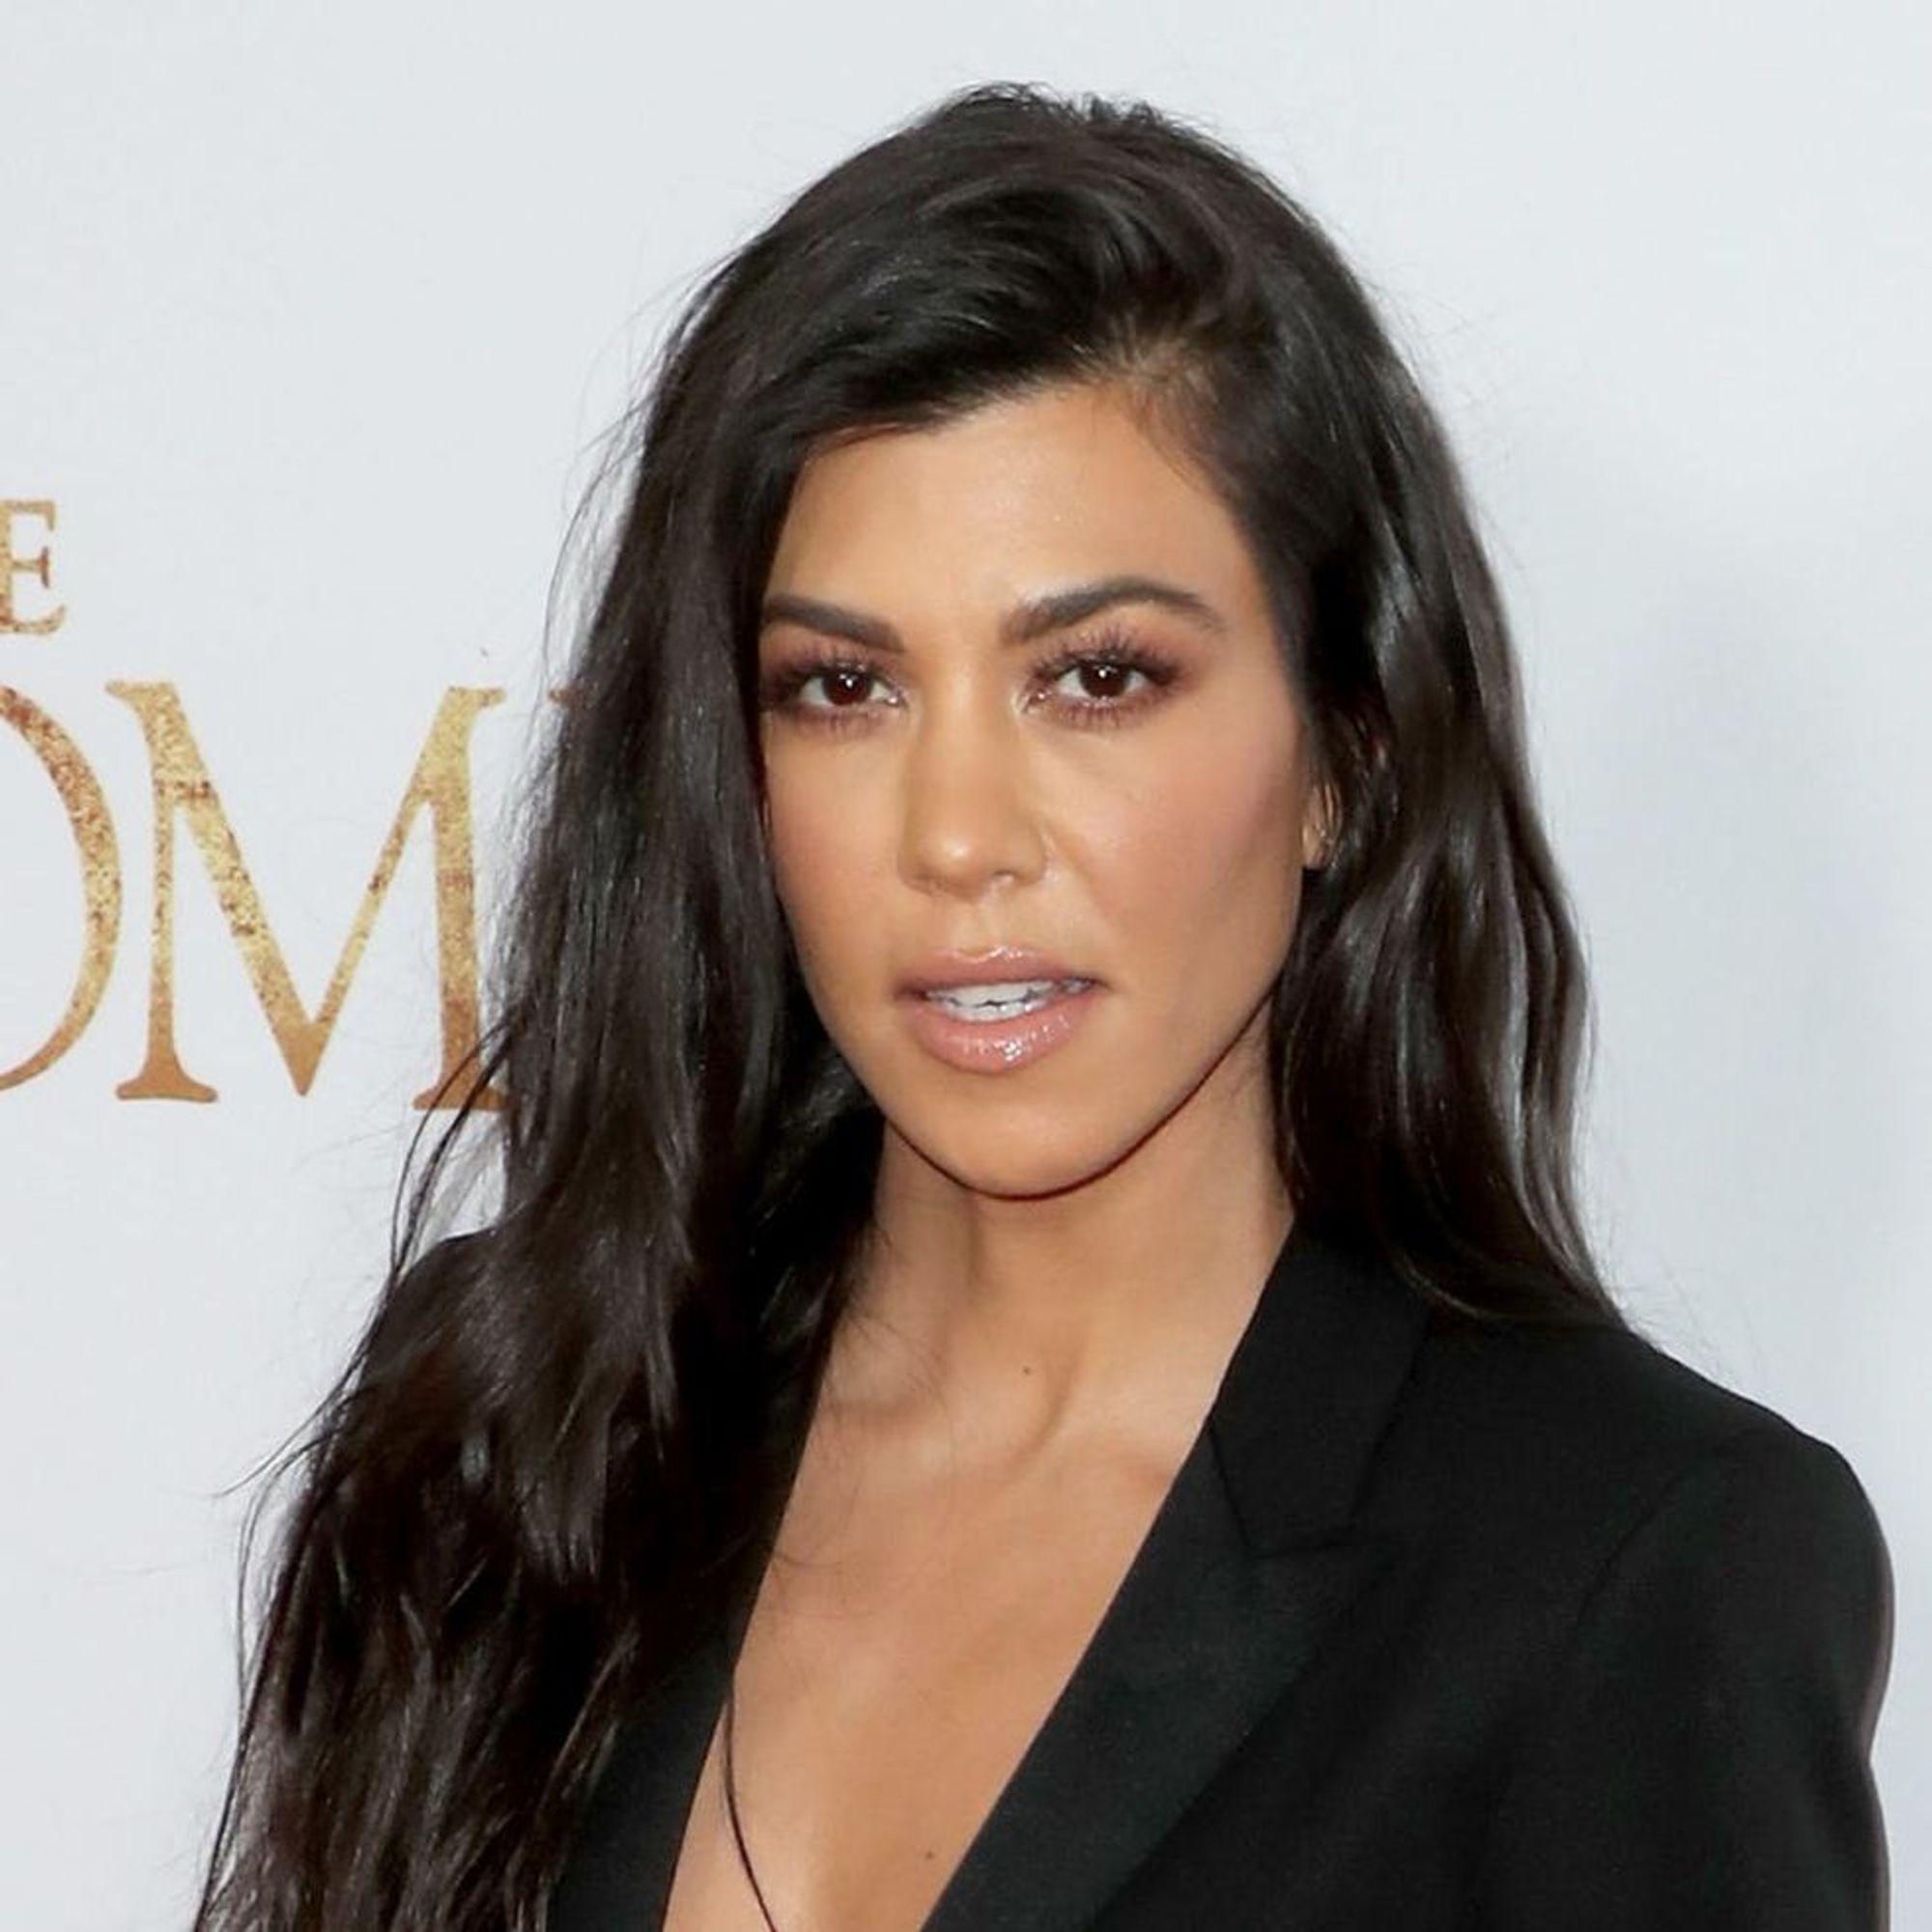 Keeping Up With the Kardashians Season 10 Episode 16